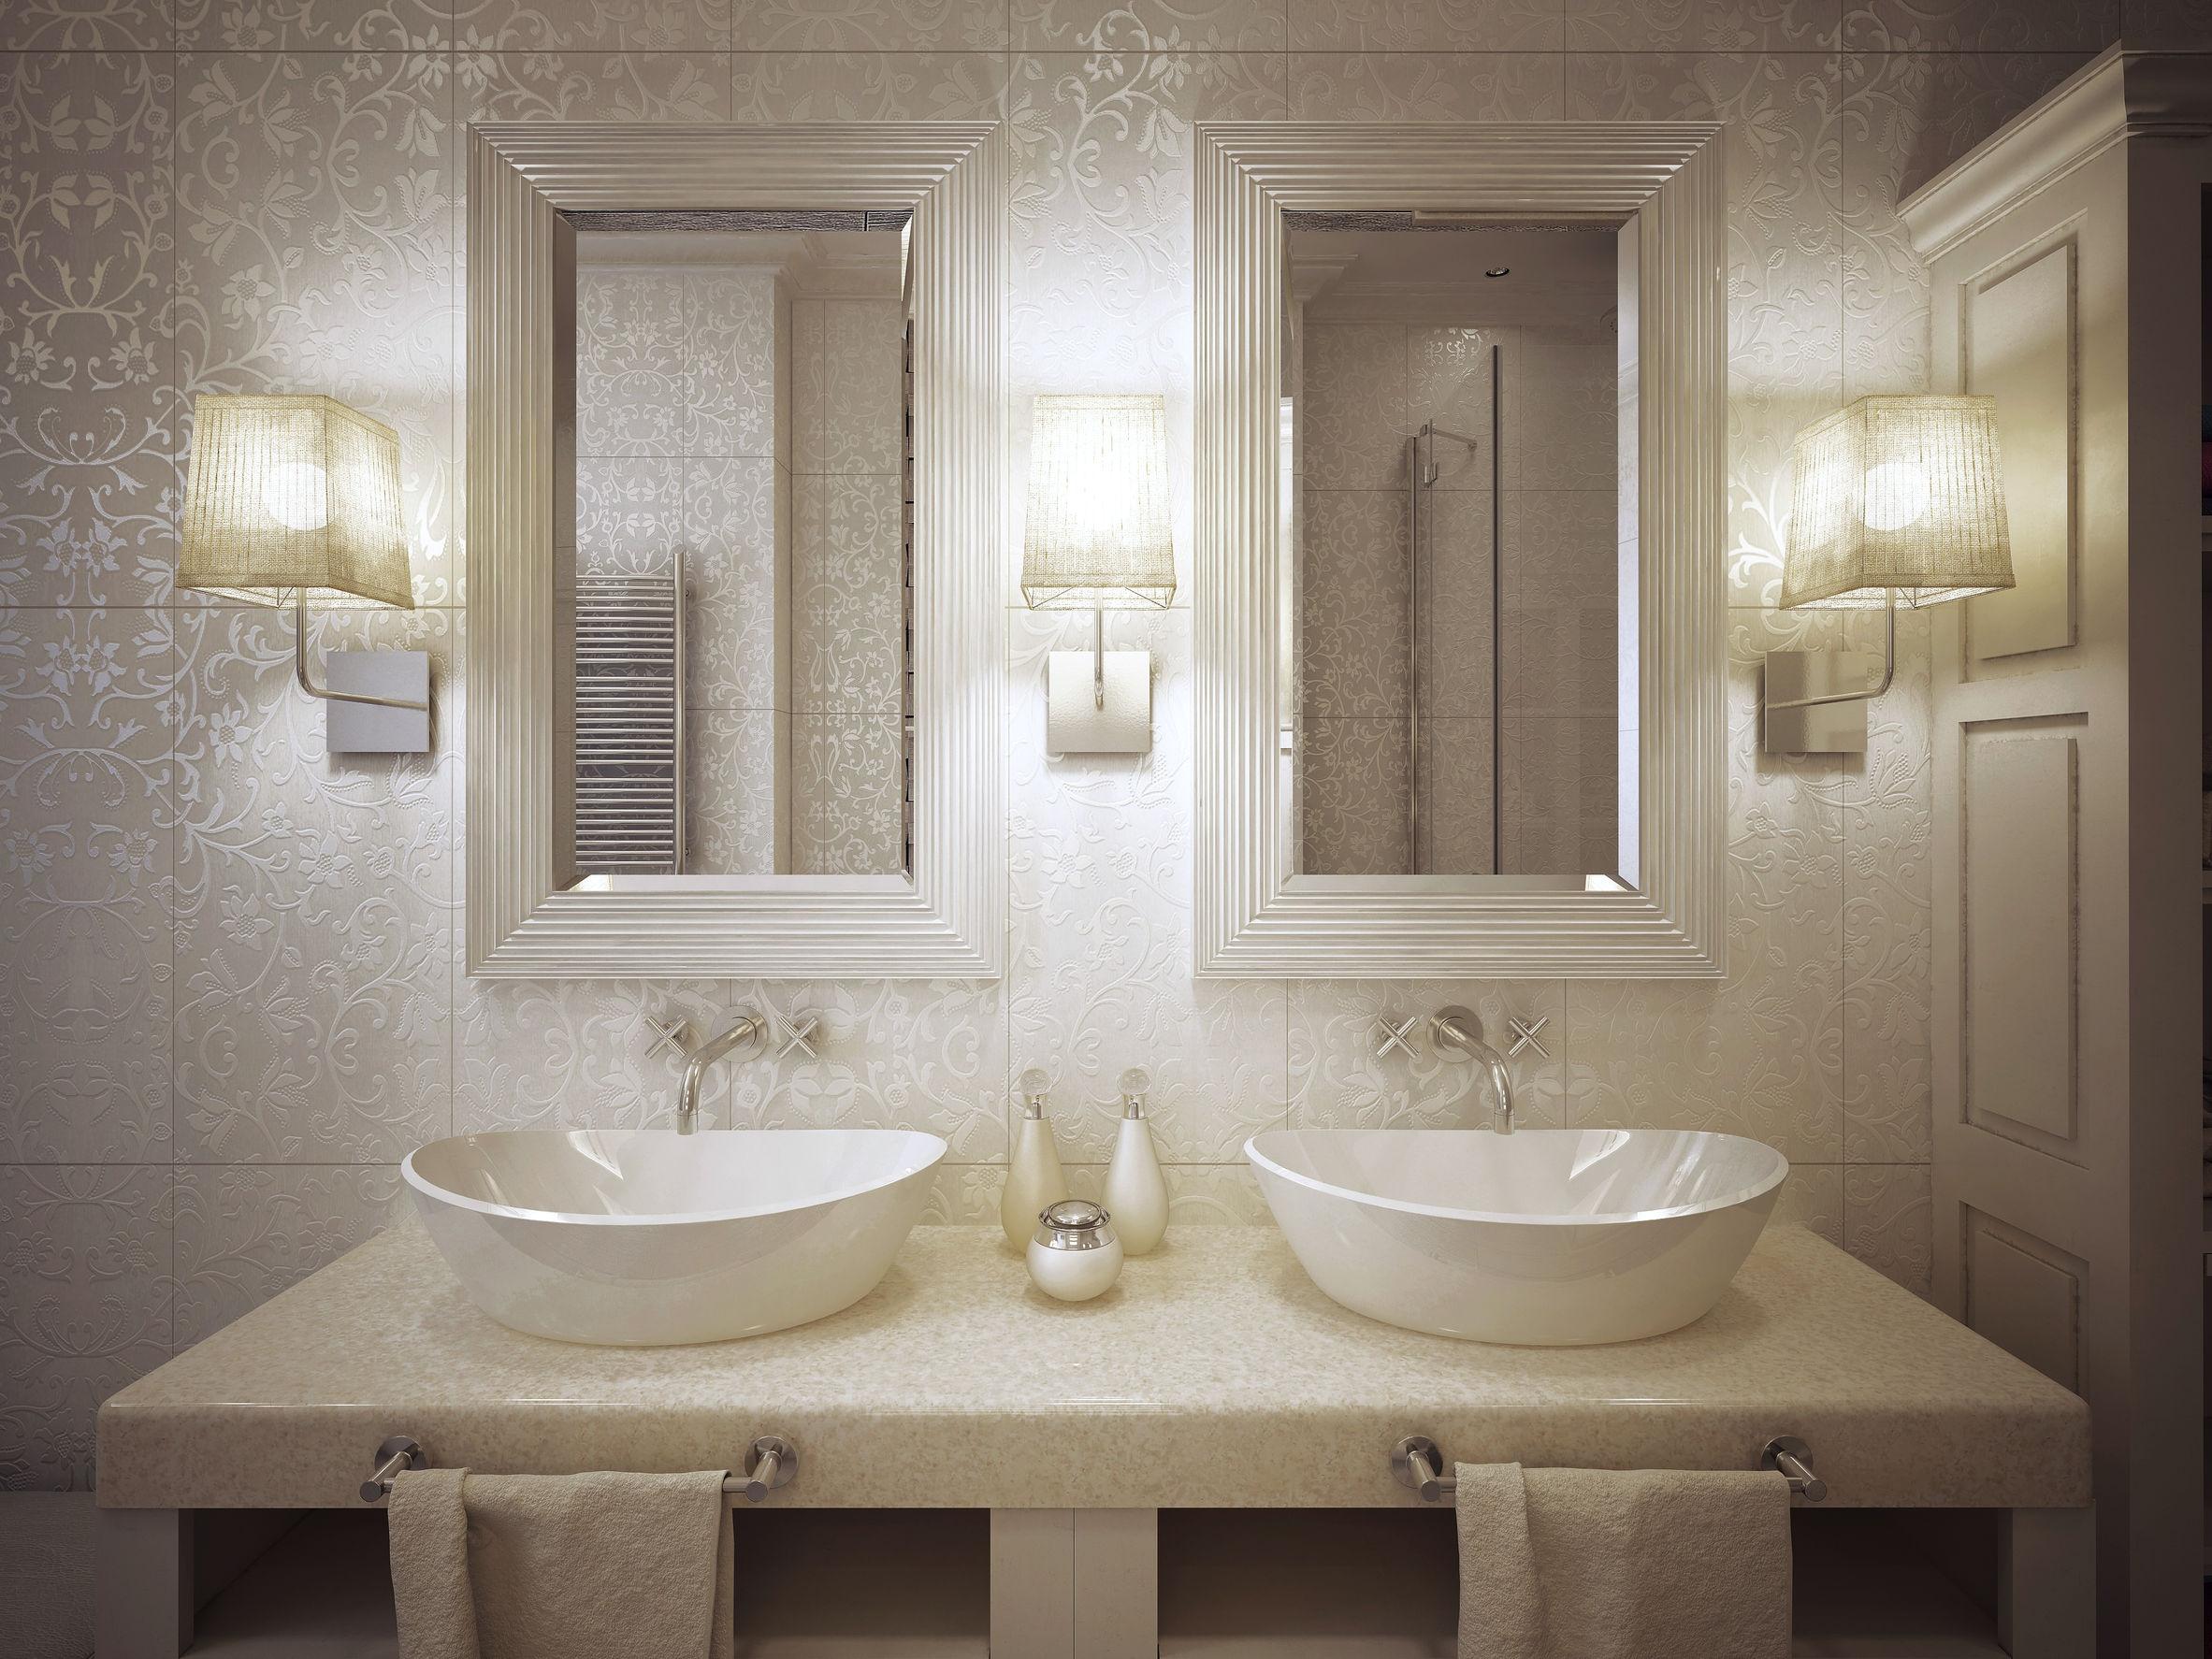 debauchery archive category lighting design interior final light fenestration medium